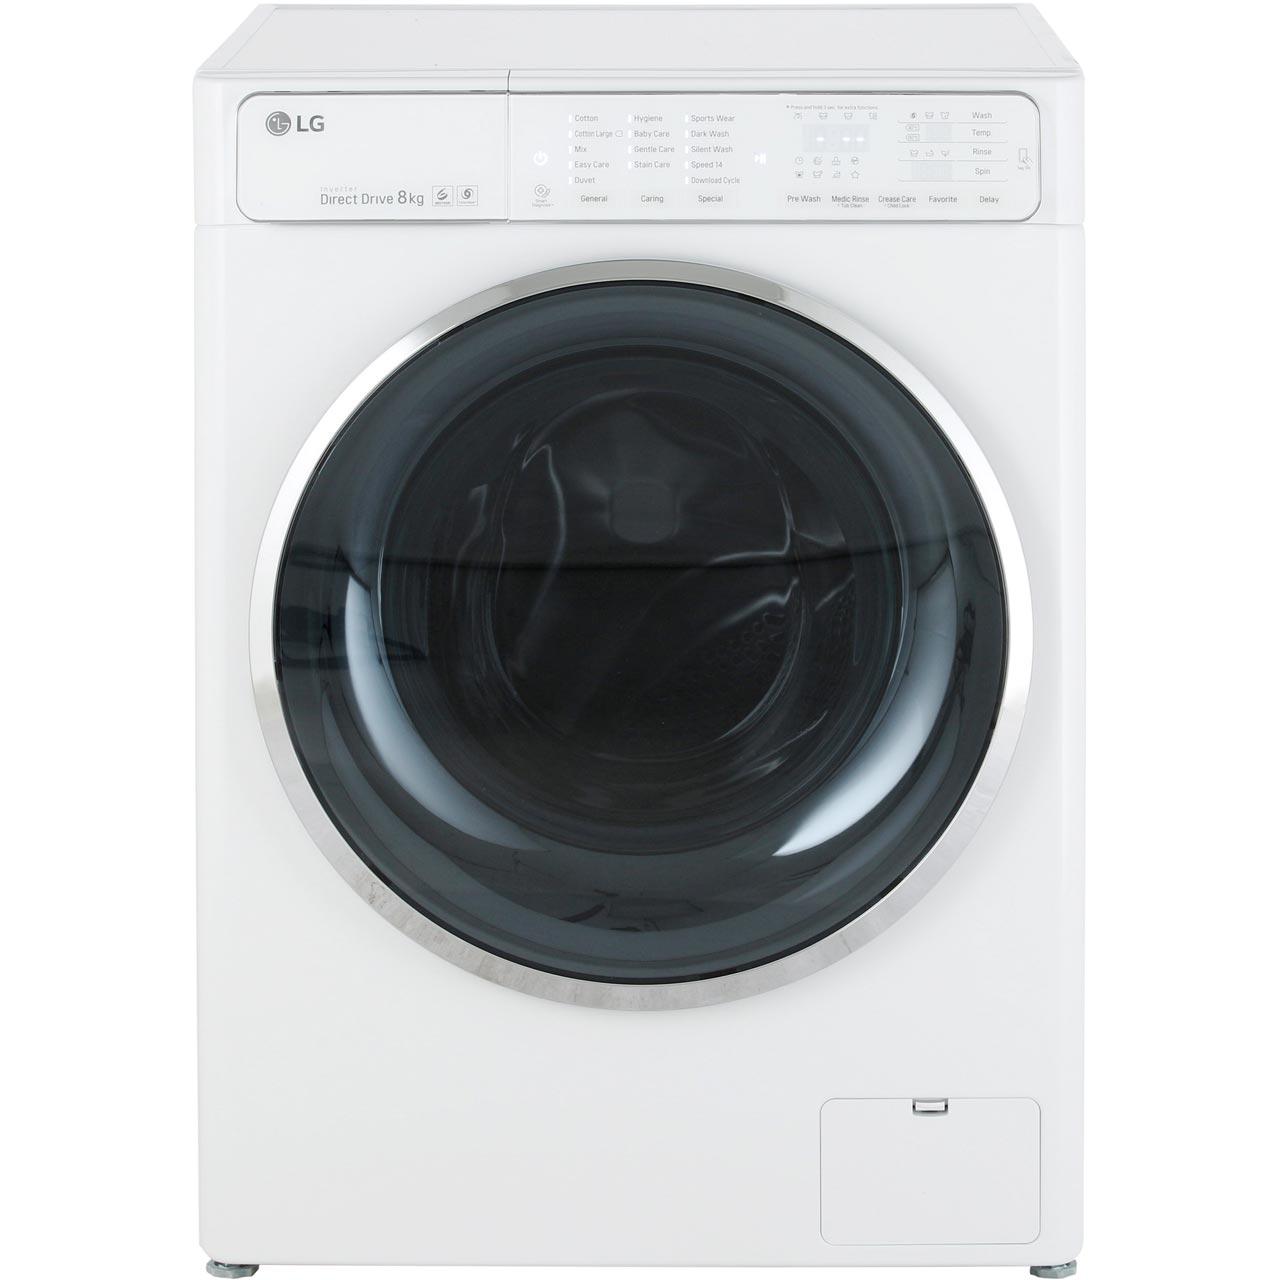 LG F14U1TCN2 8Kg Washing Machine with 1400 rpm Review